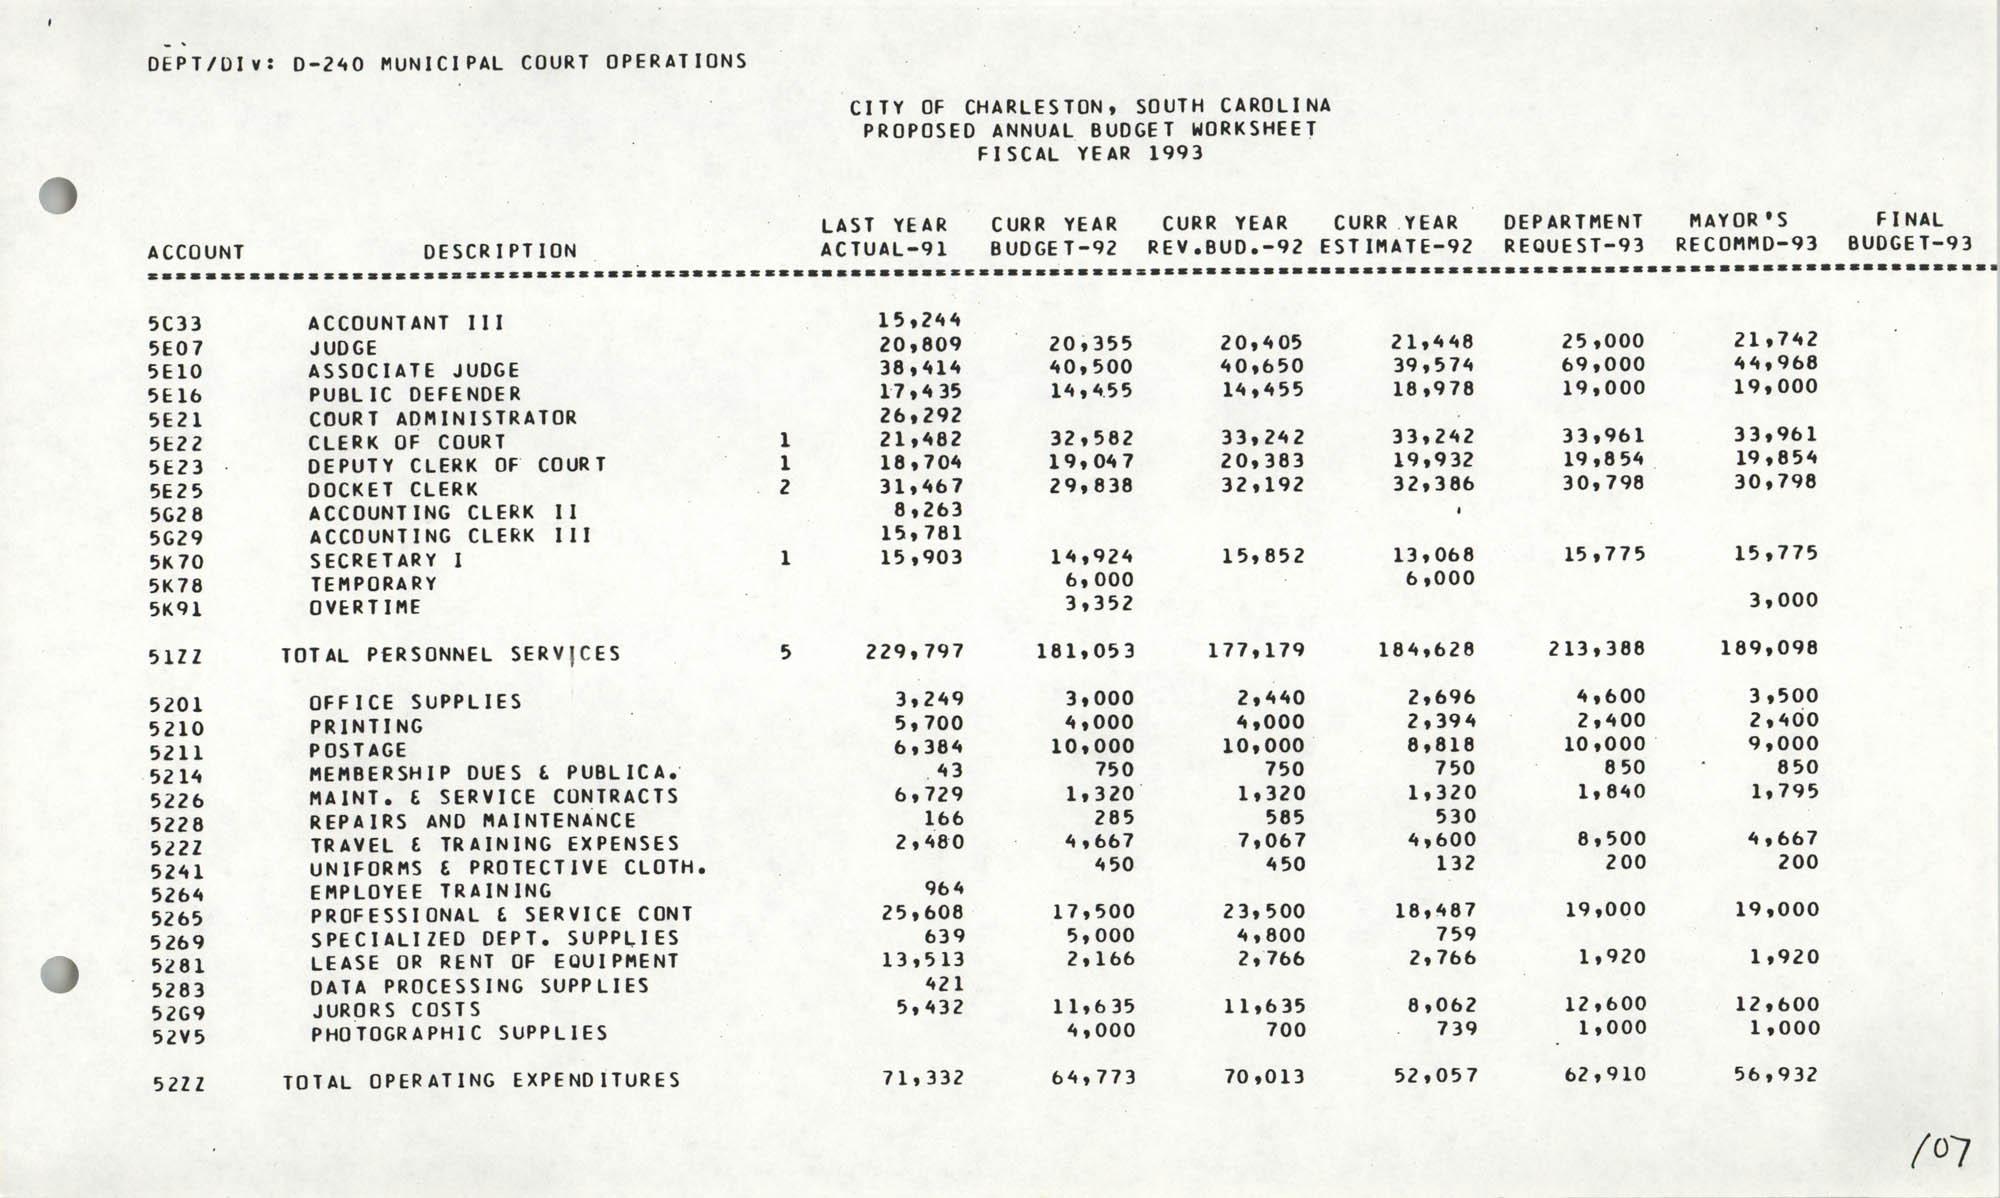 The City Council of Charleston, South Carolina, 1993 Budget, Page 107